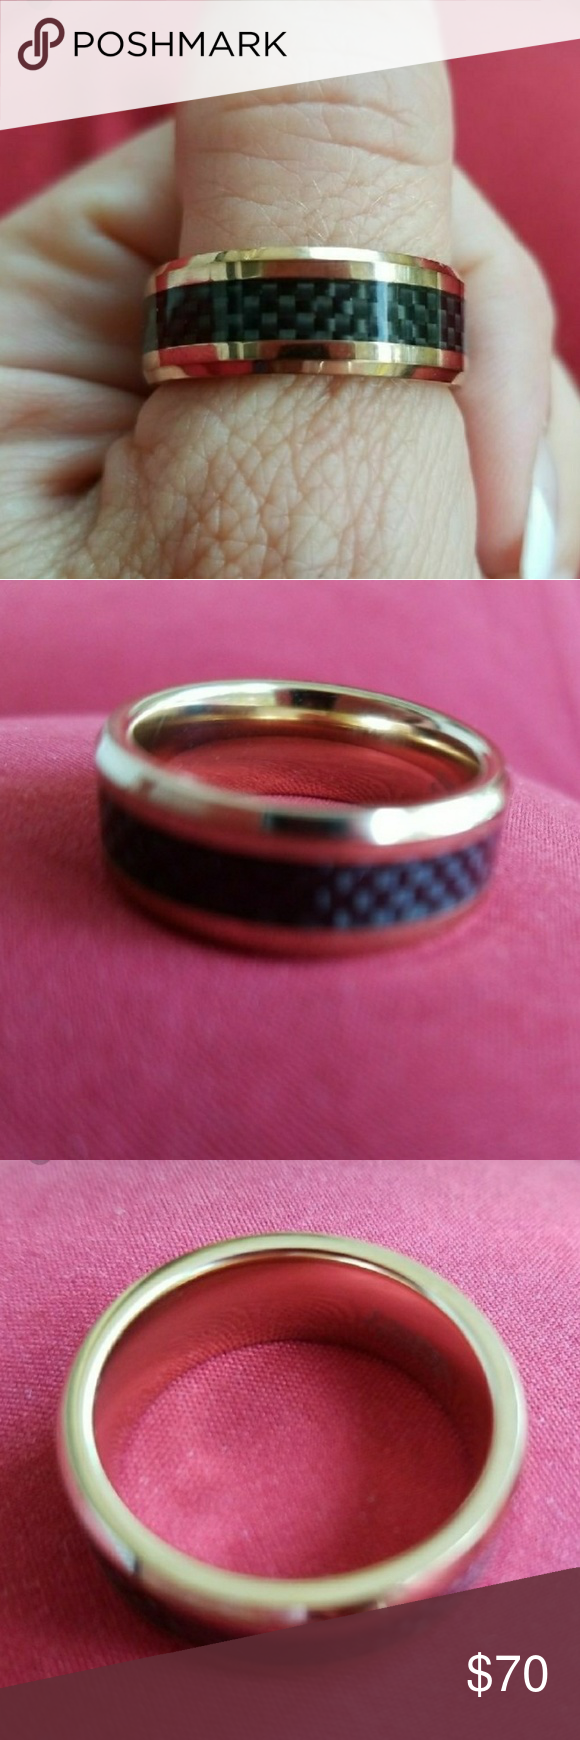 Wedding Band 24k Rose Gold Titanium